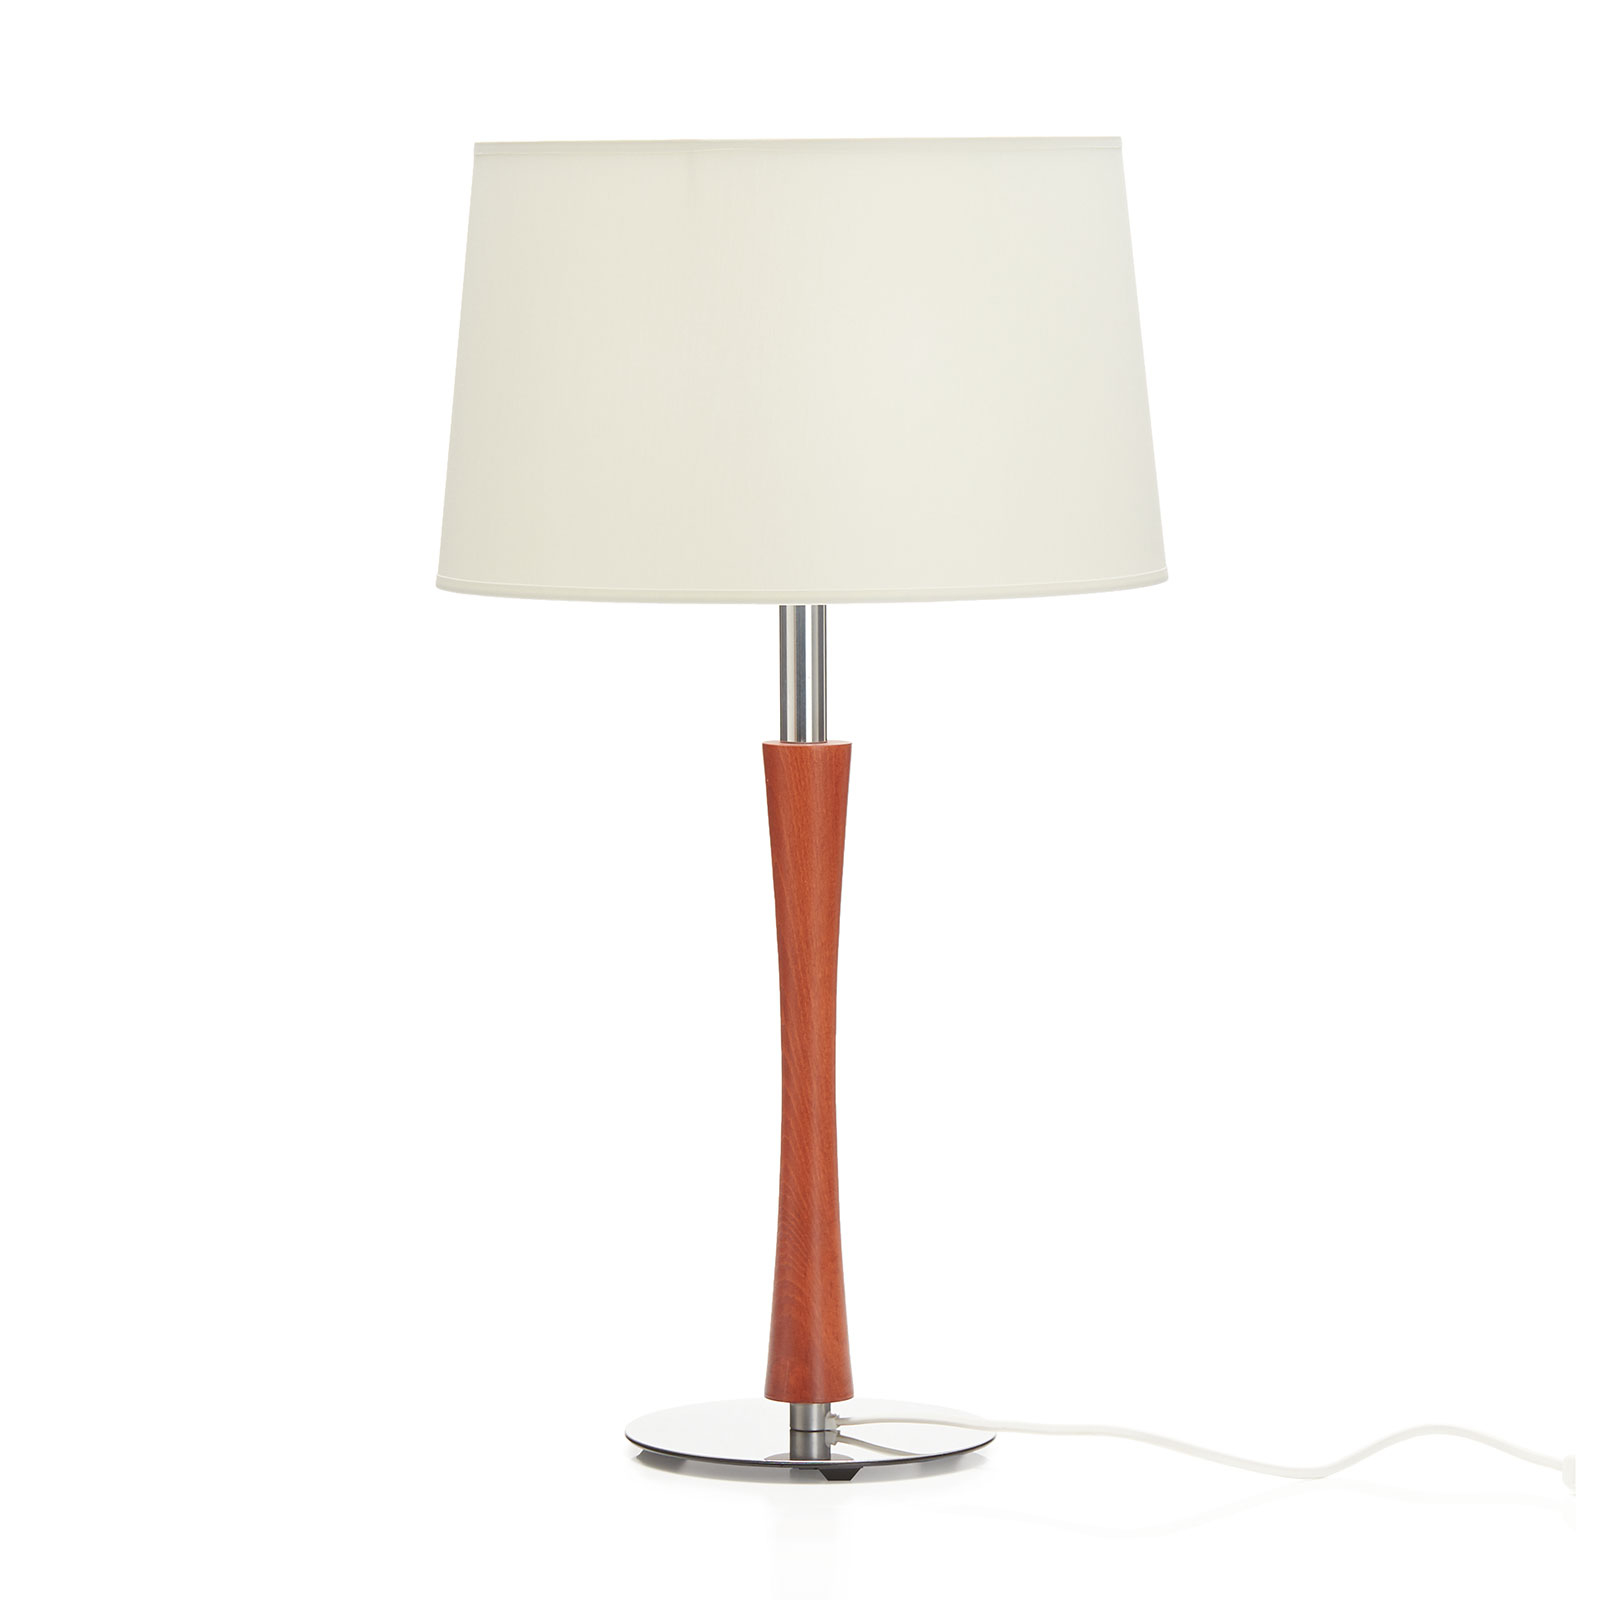 Stolní lampa Beverly ls, chrom